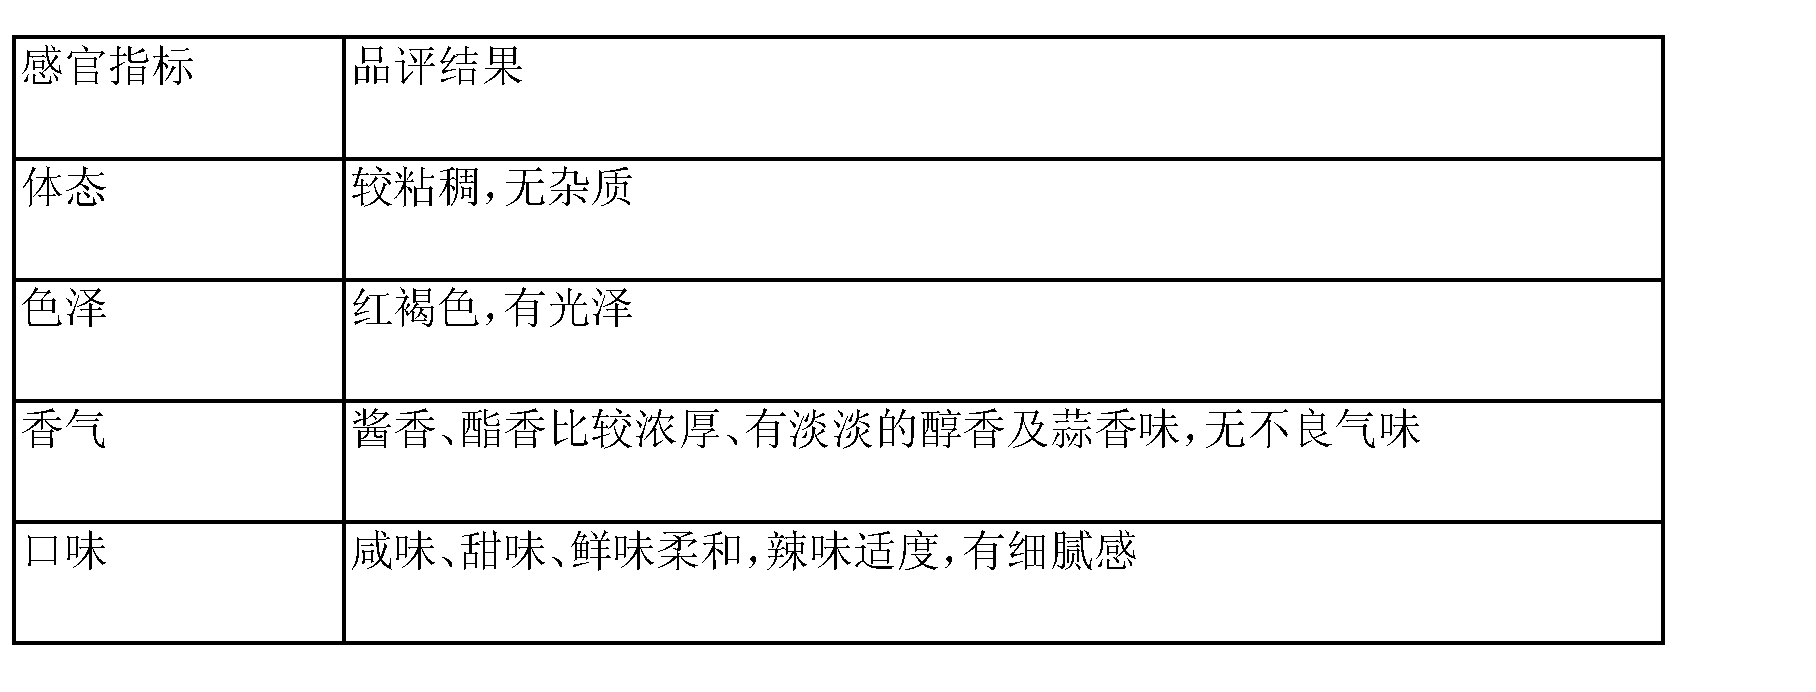 Figure CN103070387AD00272